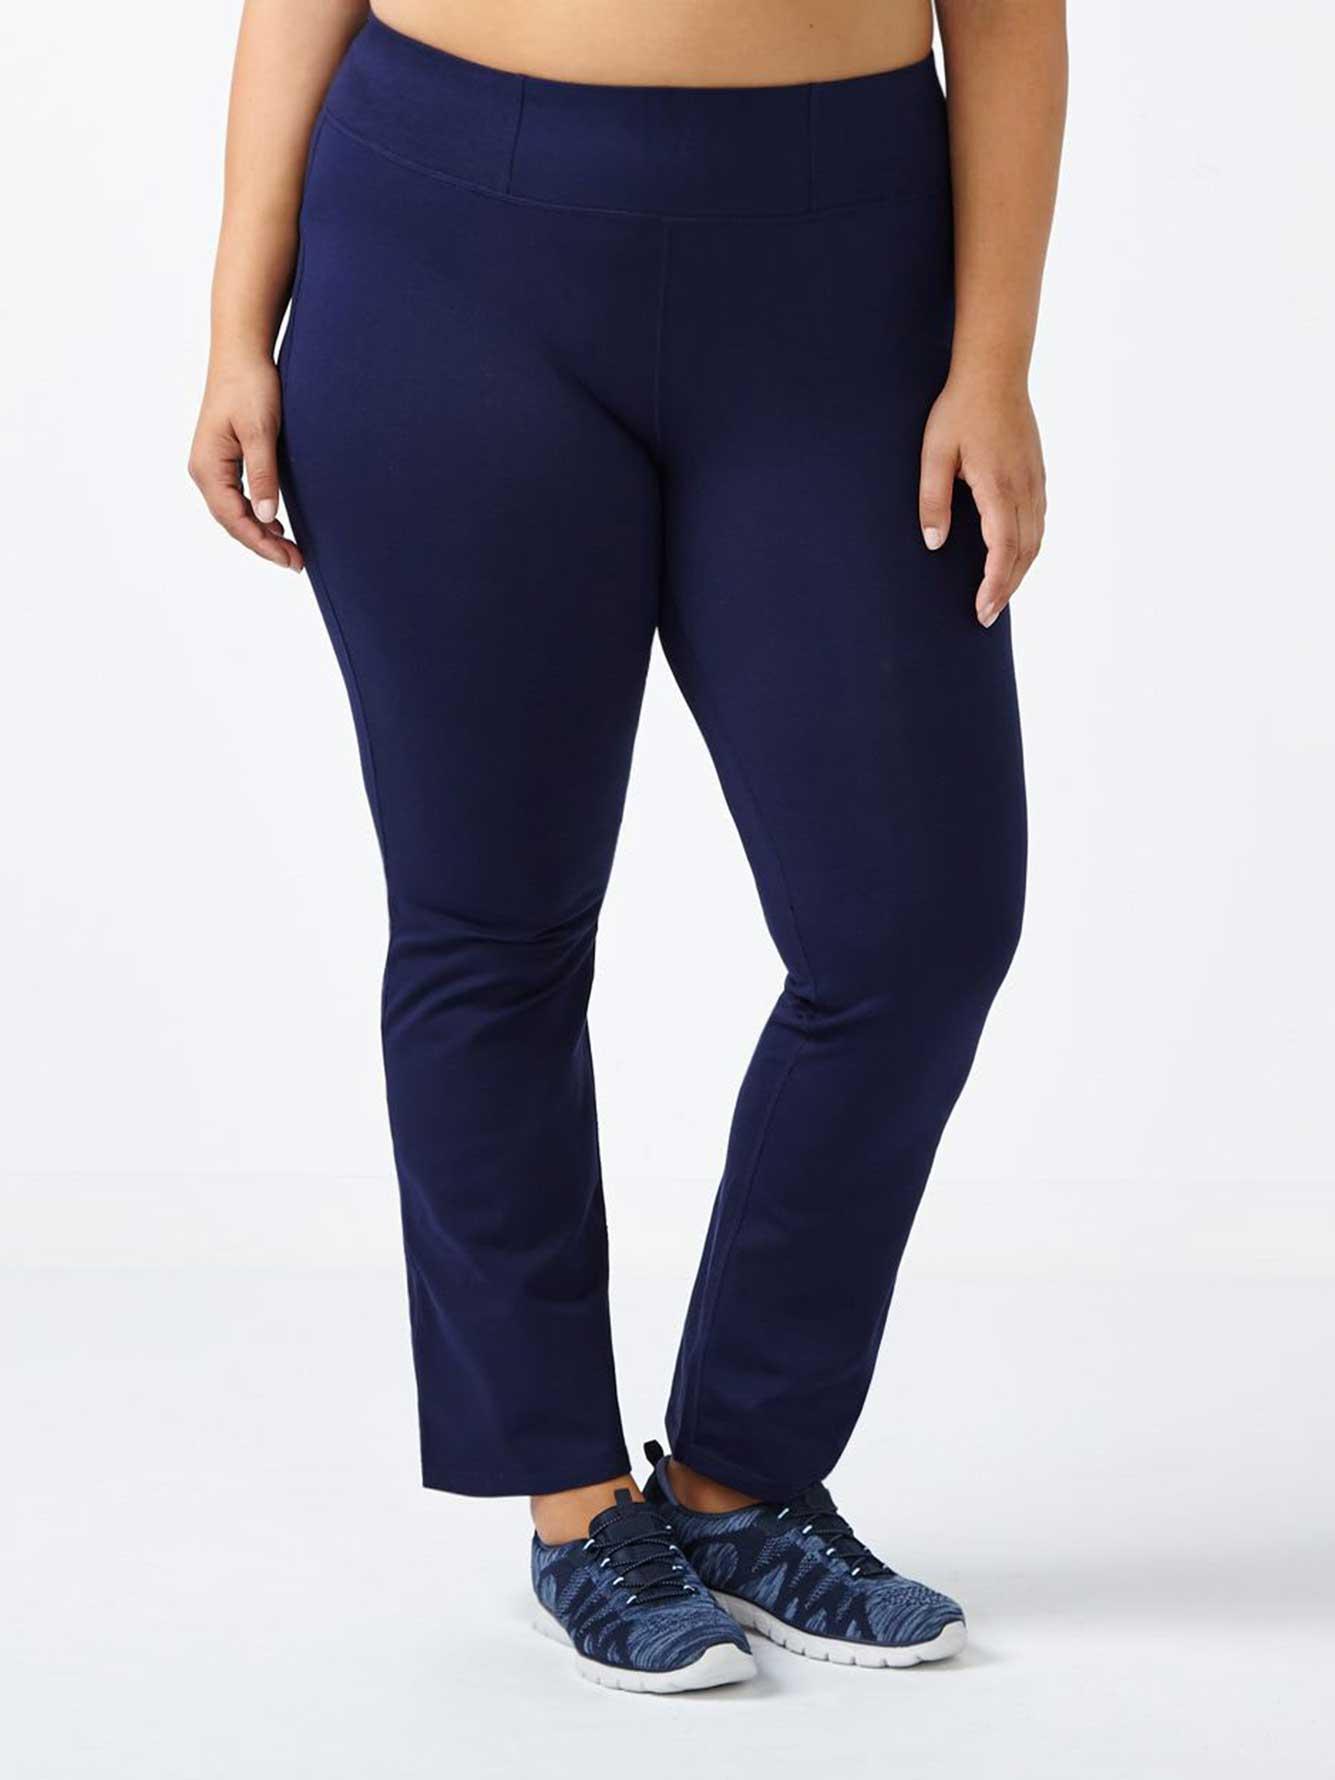 6a49b42bf8185 Essentials - Petite Plus-Size Basic Yoga Pant | Penningtons